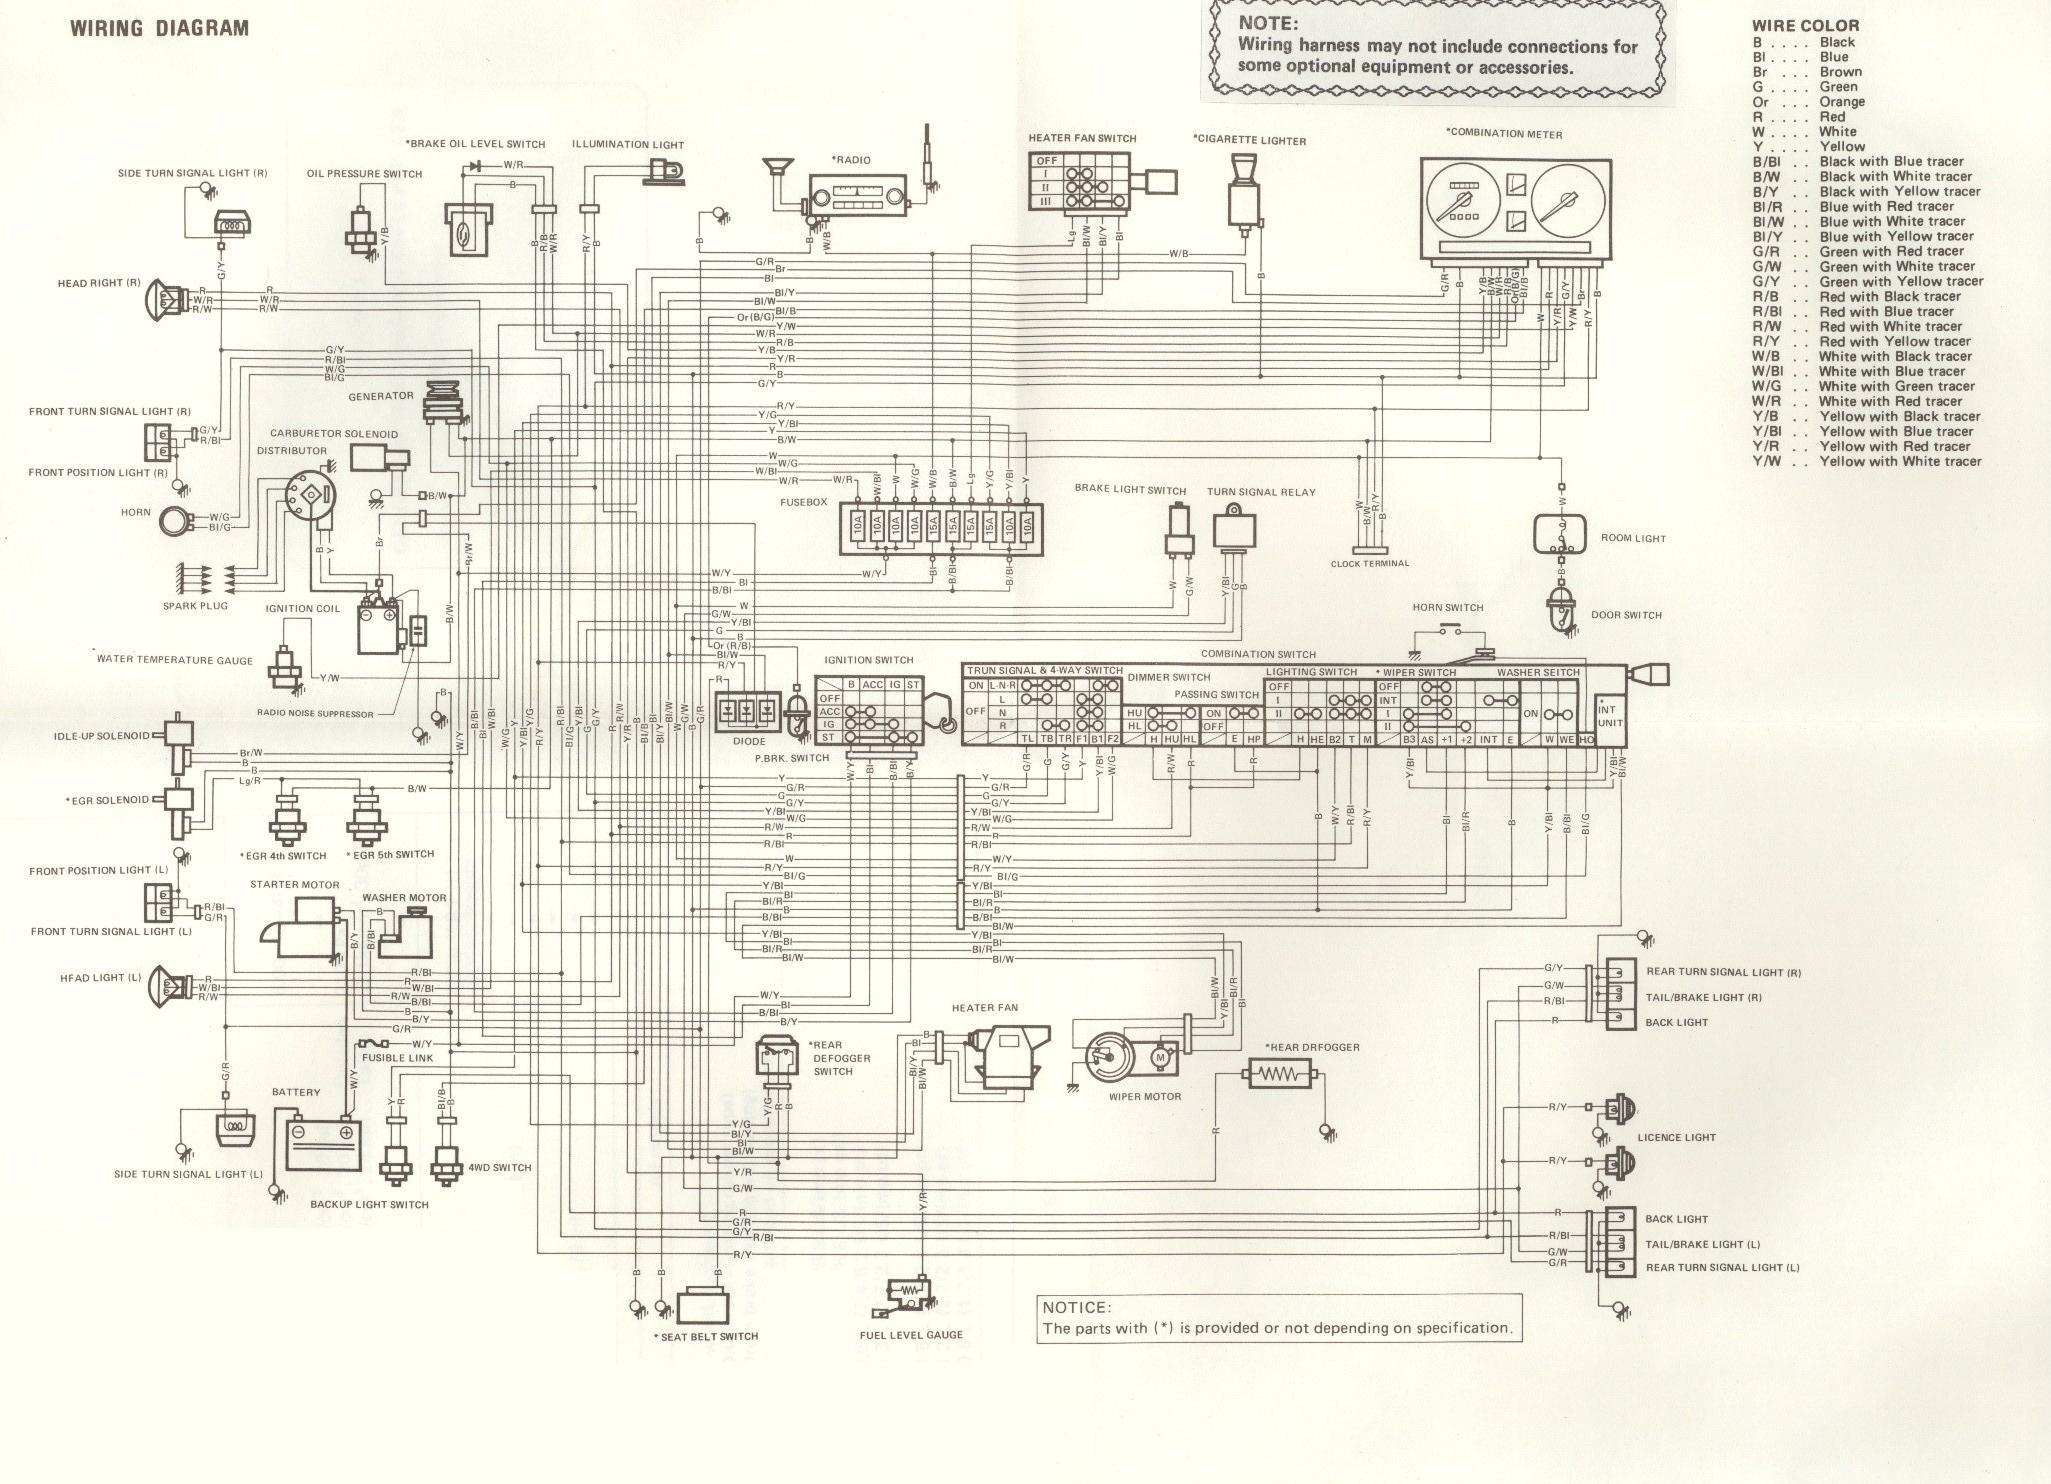 DIAGRAM] Suzuki Samurai Workshop Wiring Diagram FULL Version HD Quality Wiring  Diagram - AMPSEARCH.KINGGO.FRampsearch kinggo fr